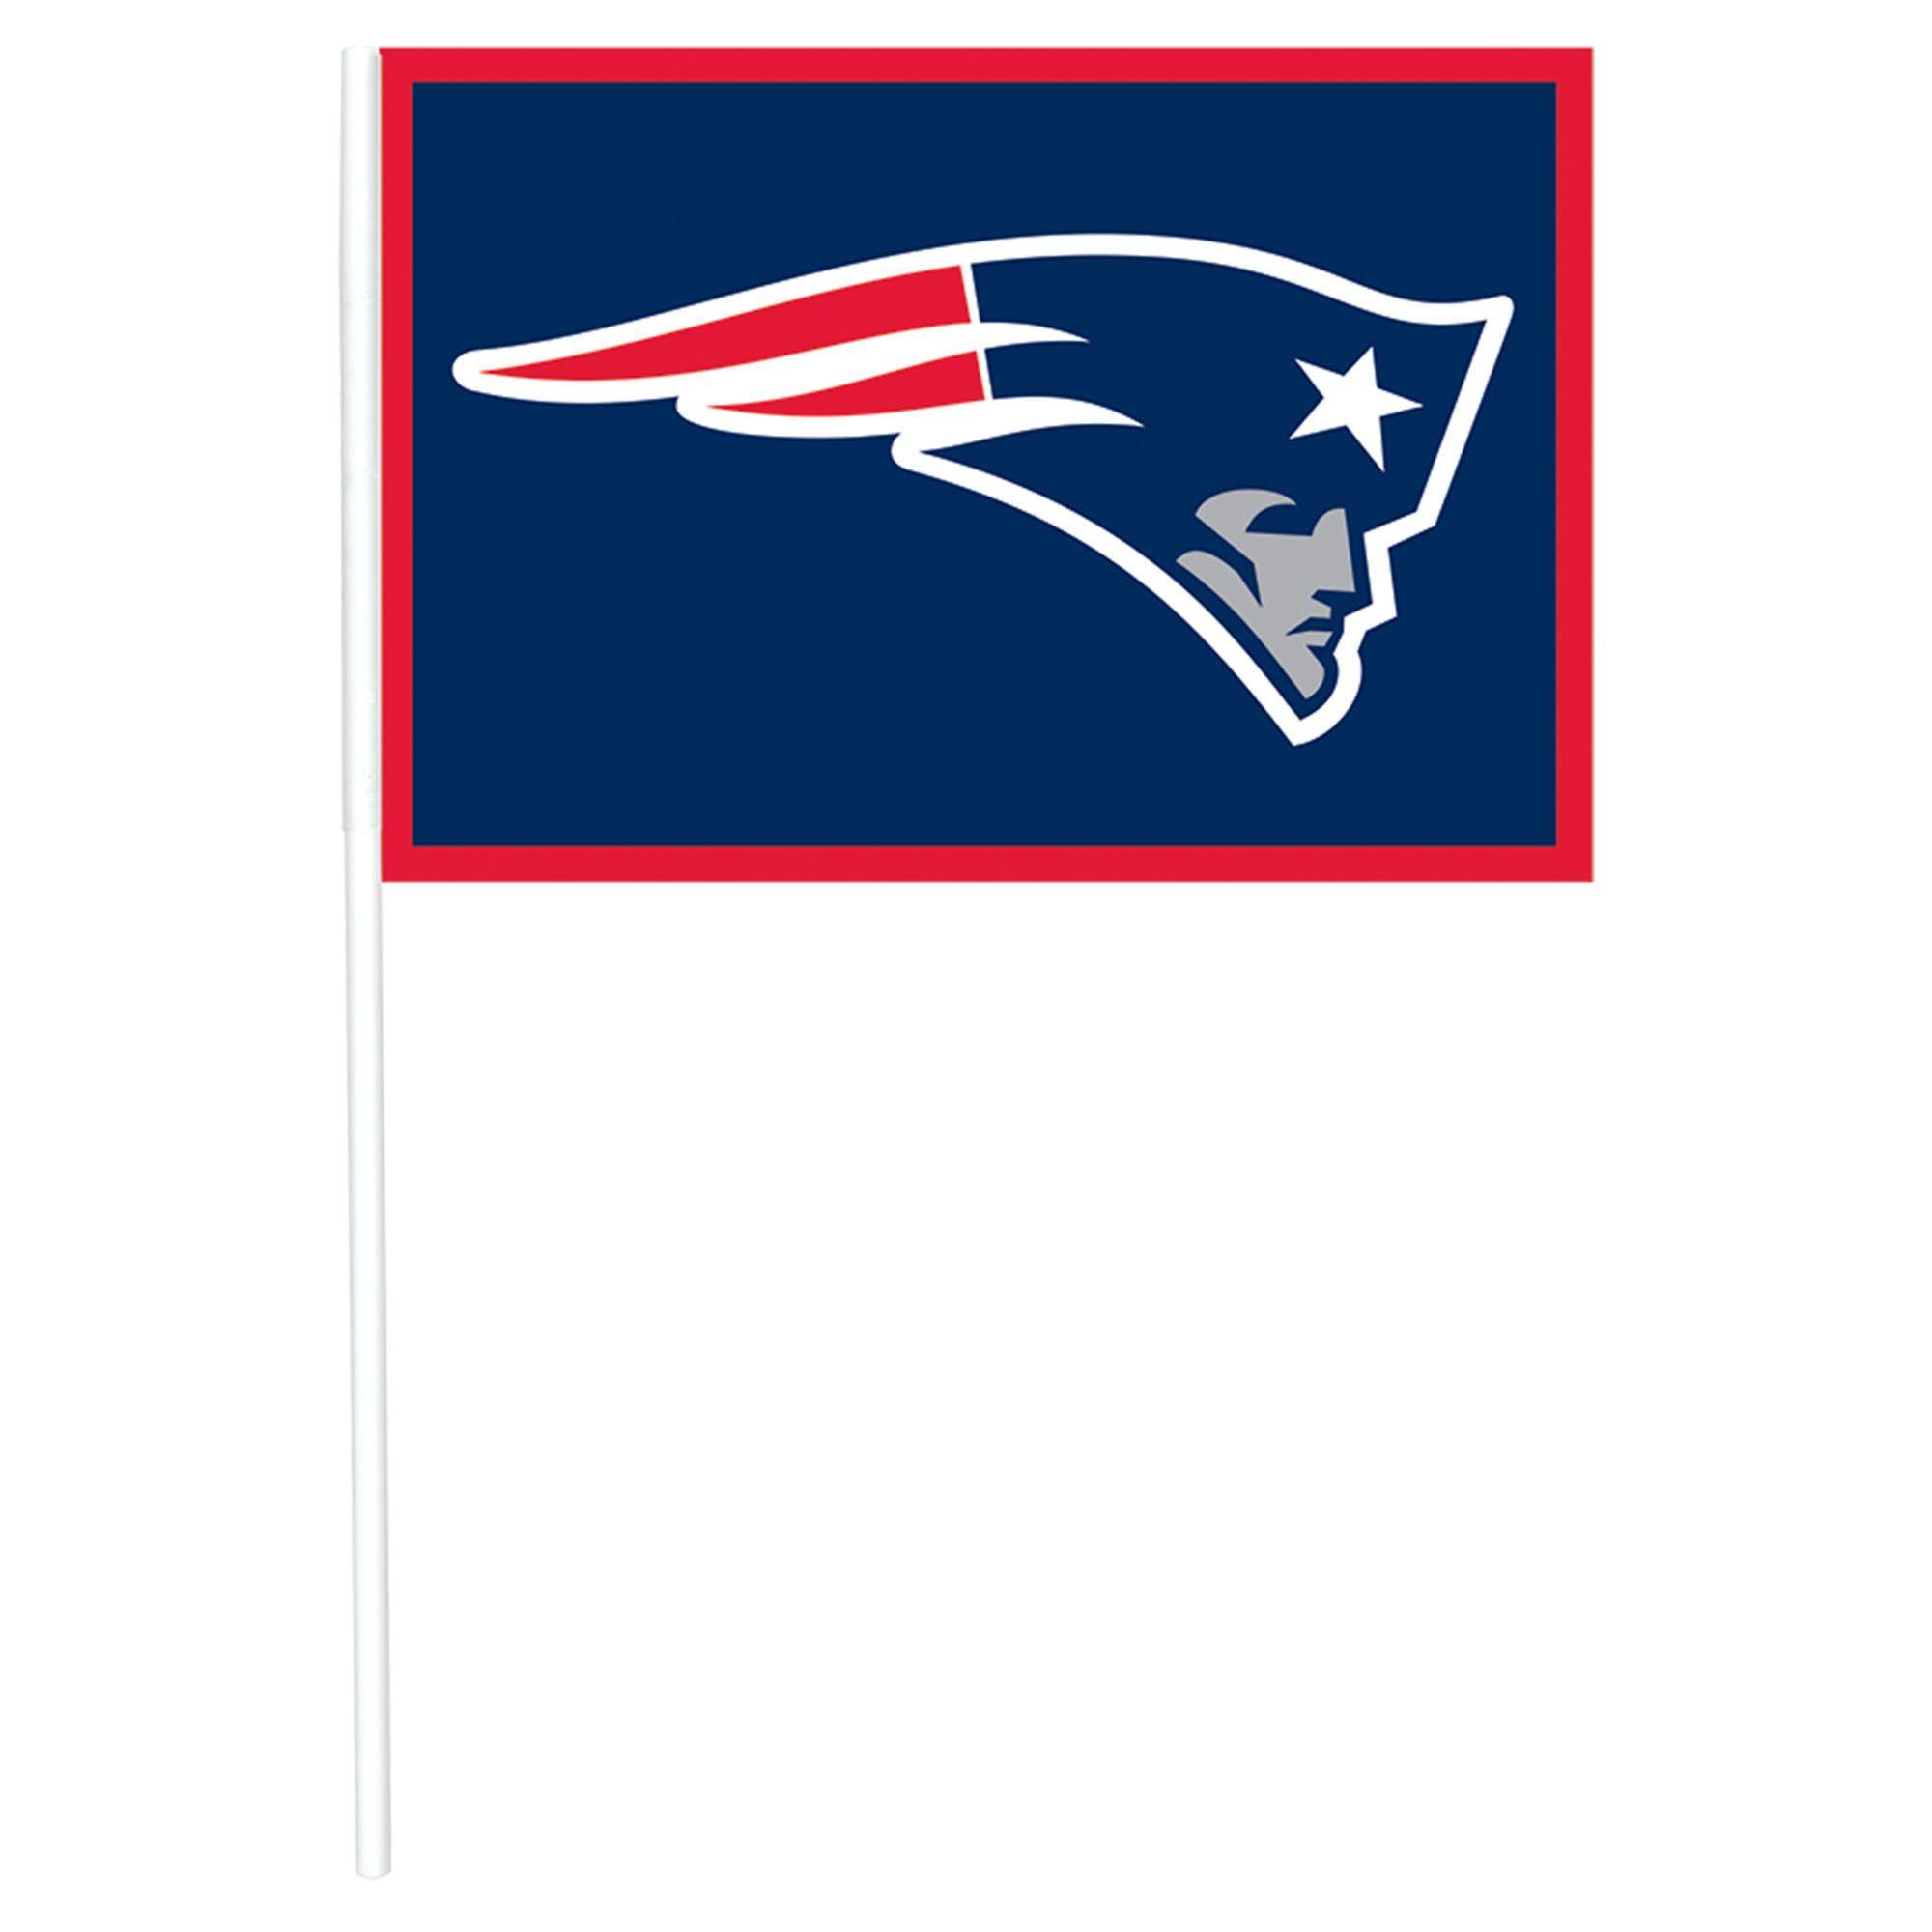 New England Patriots Flags